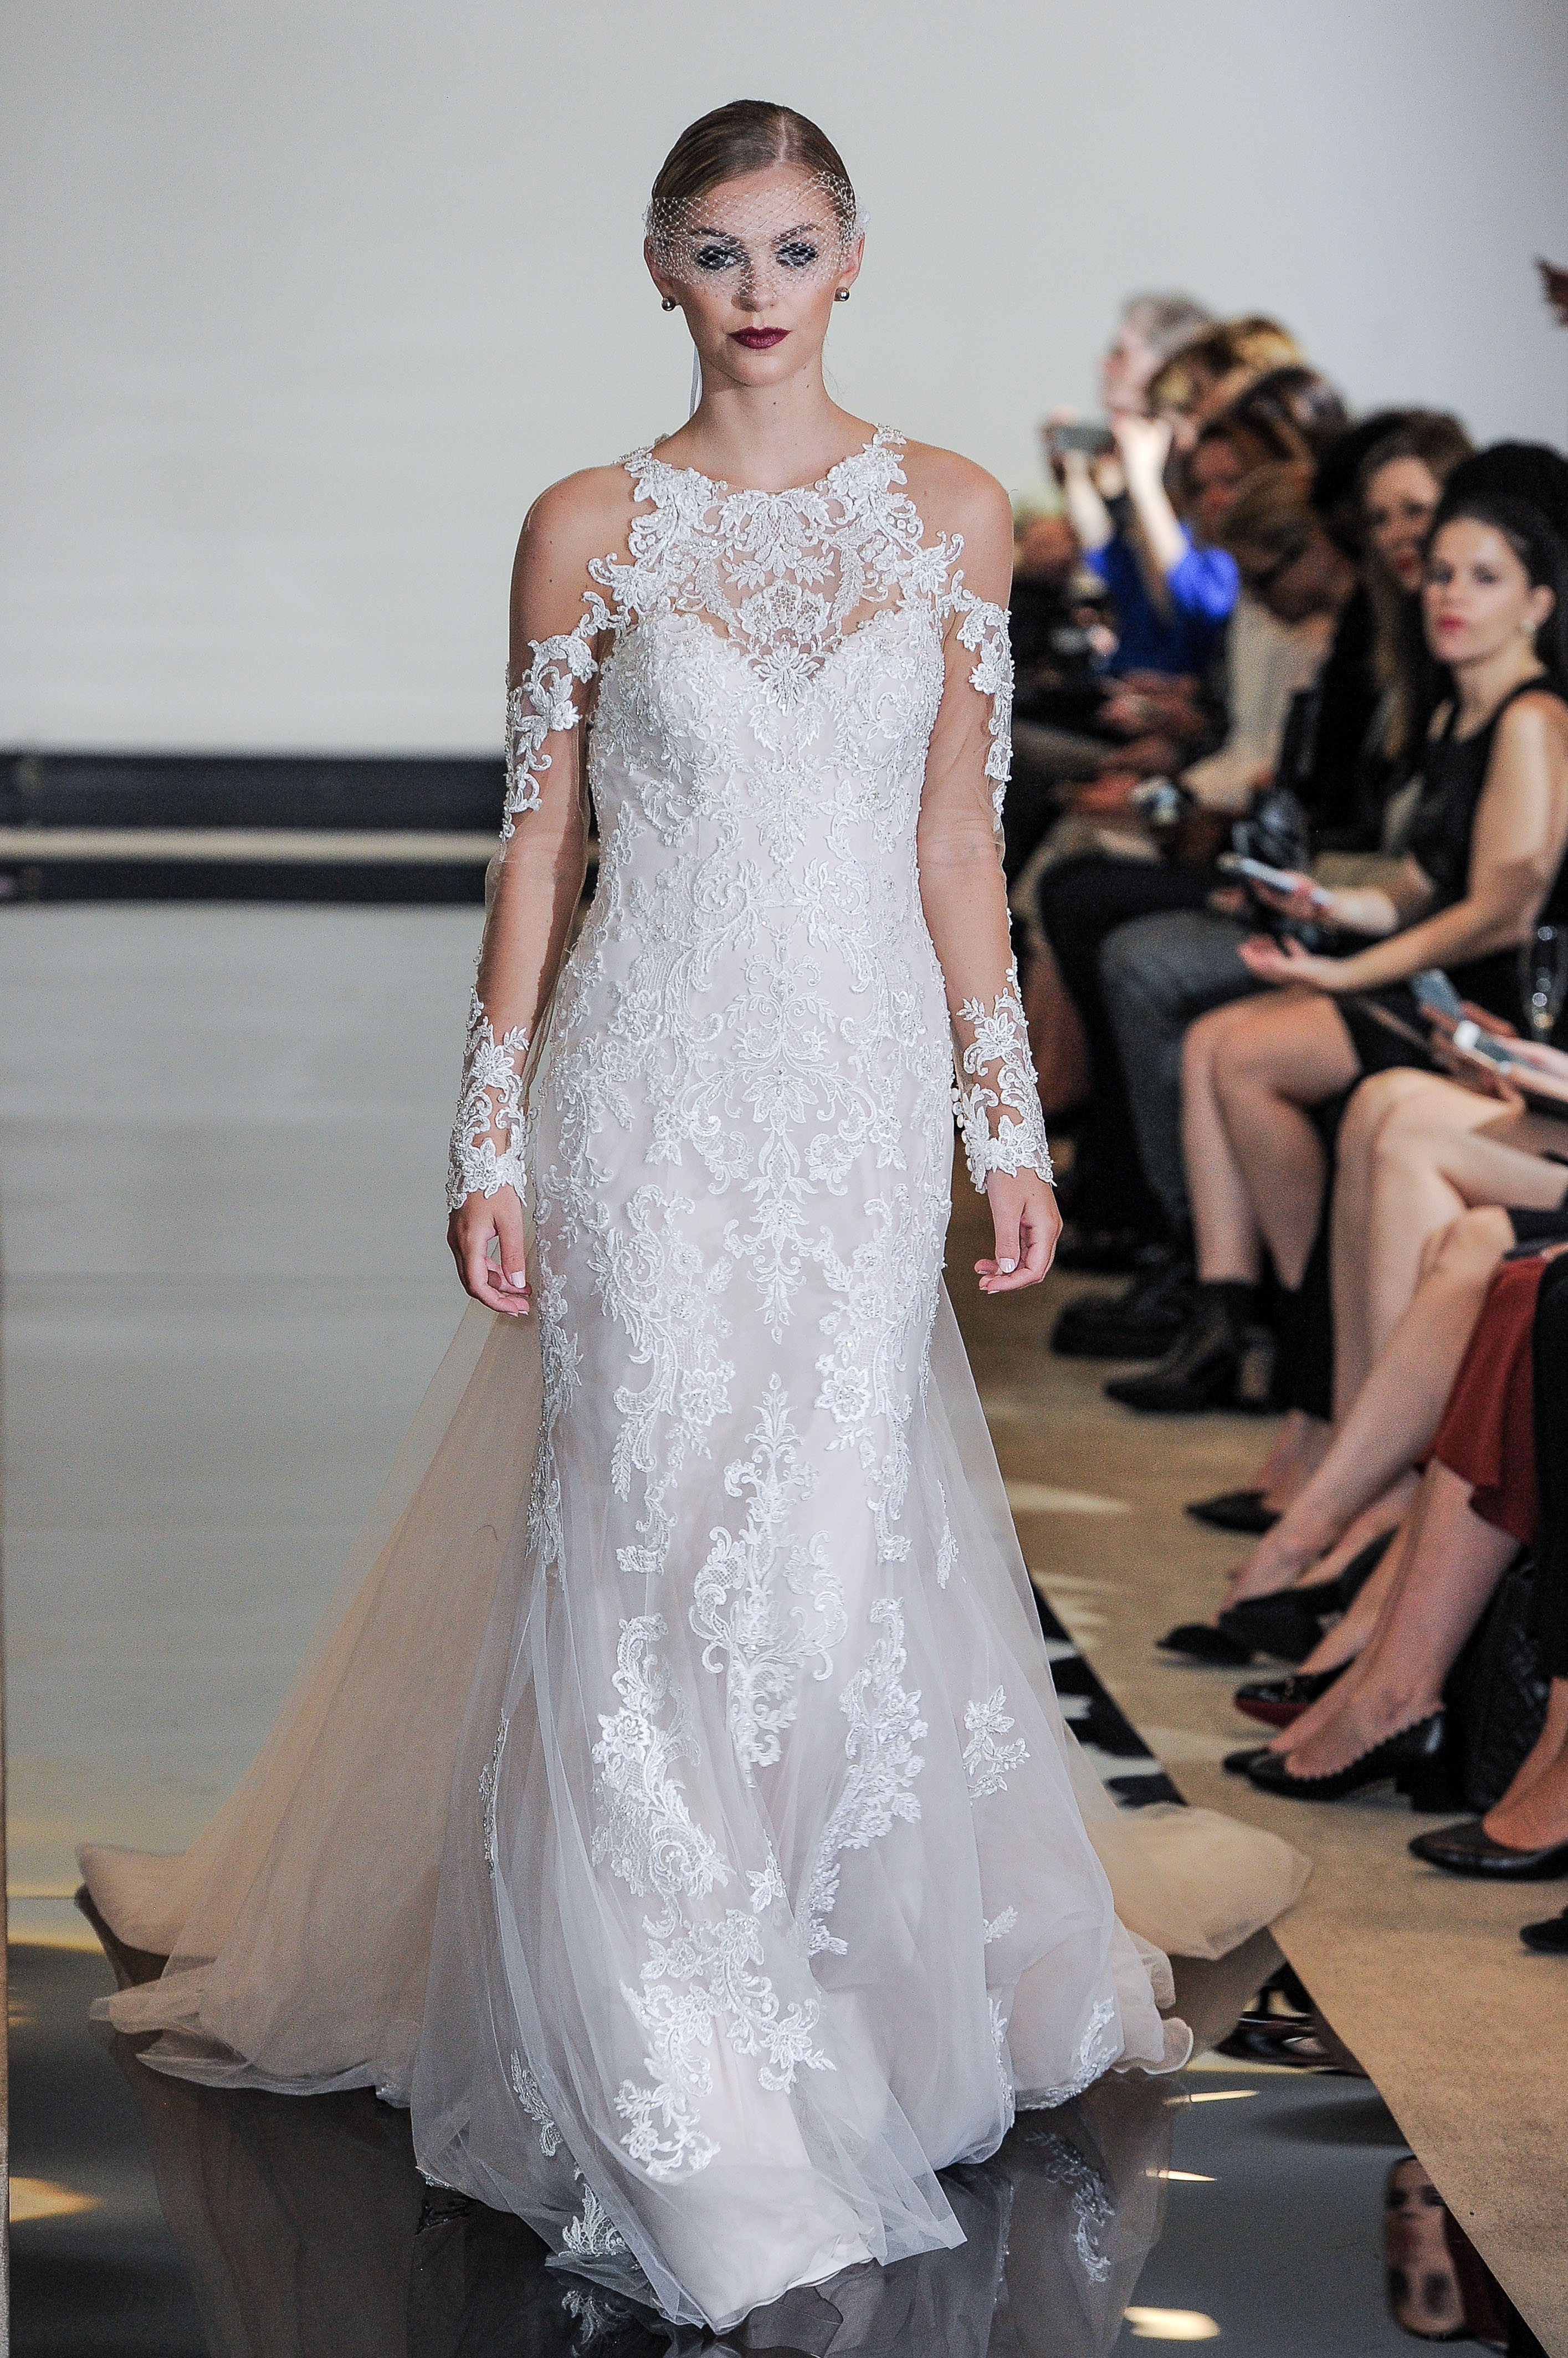 Justin Alexander Wedding Dress with Three-quarter length sleeves Spring 2018